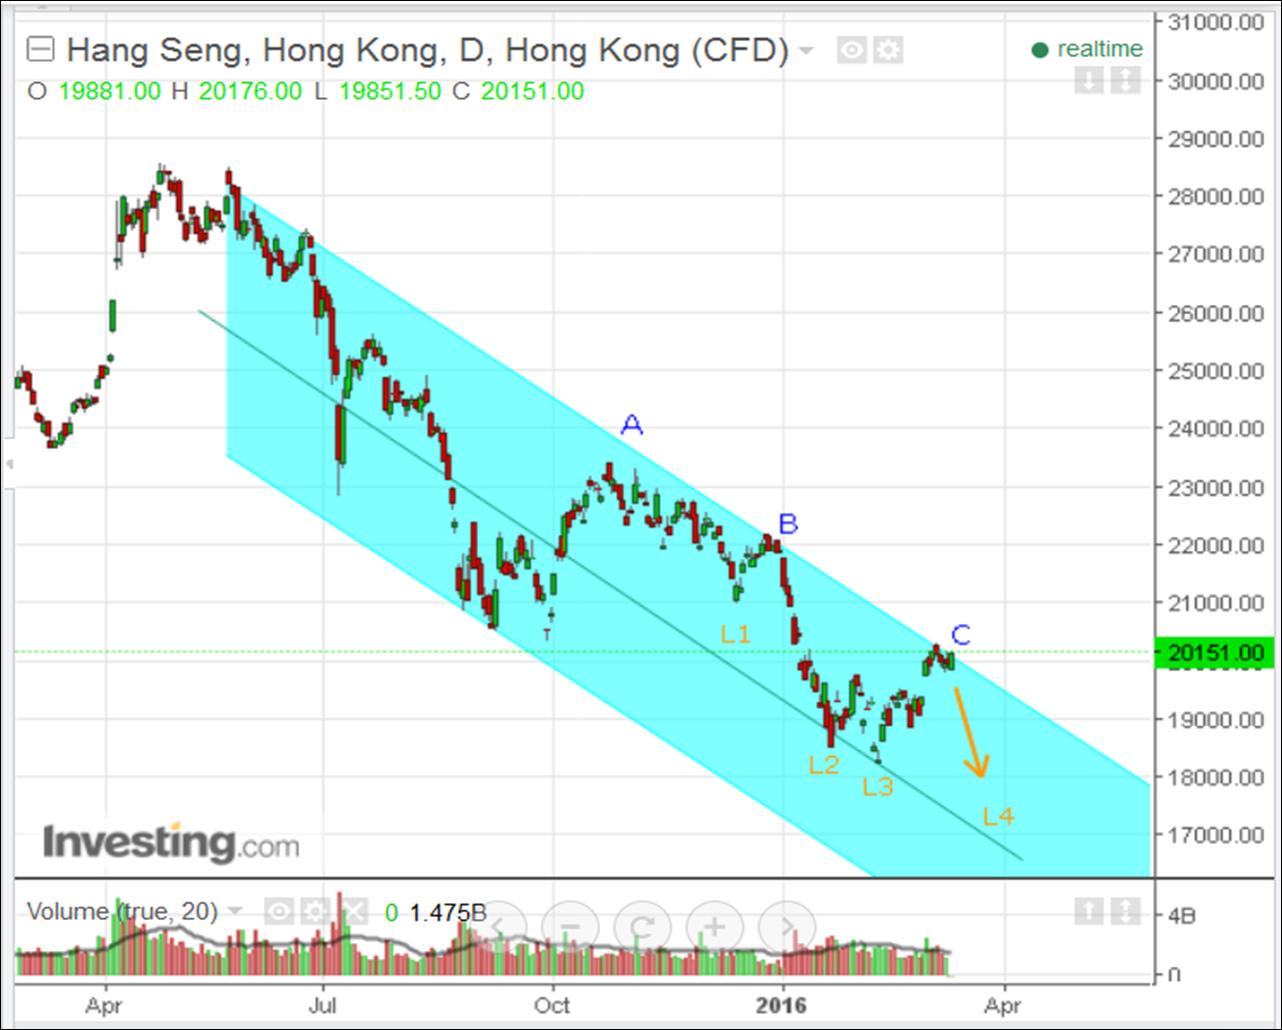 Hang seng trading system